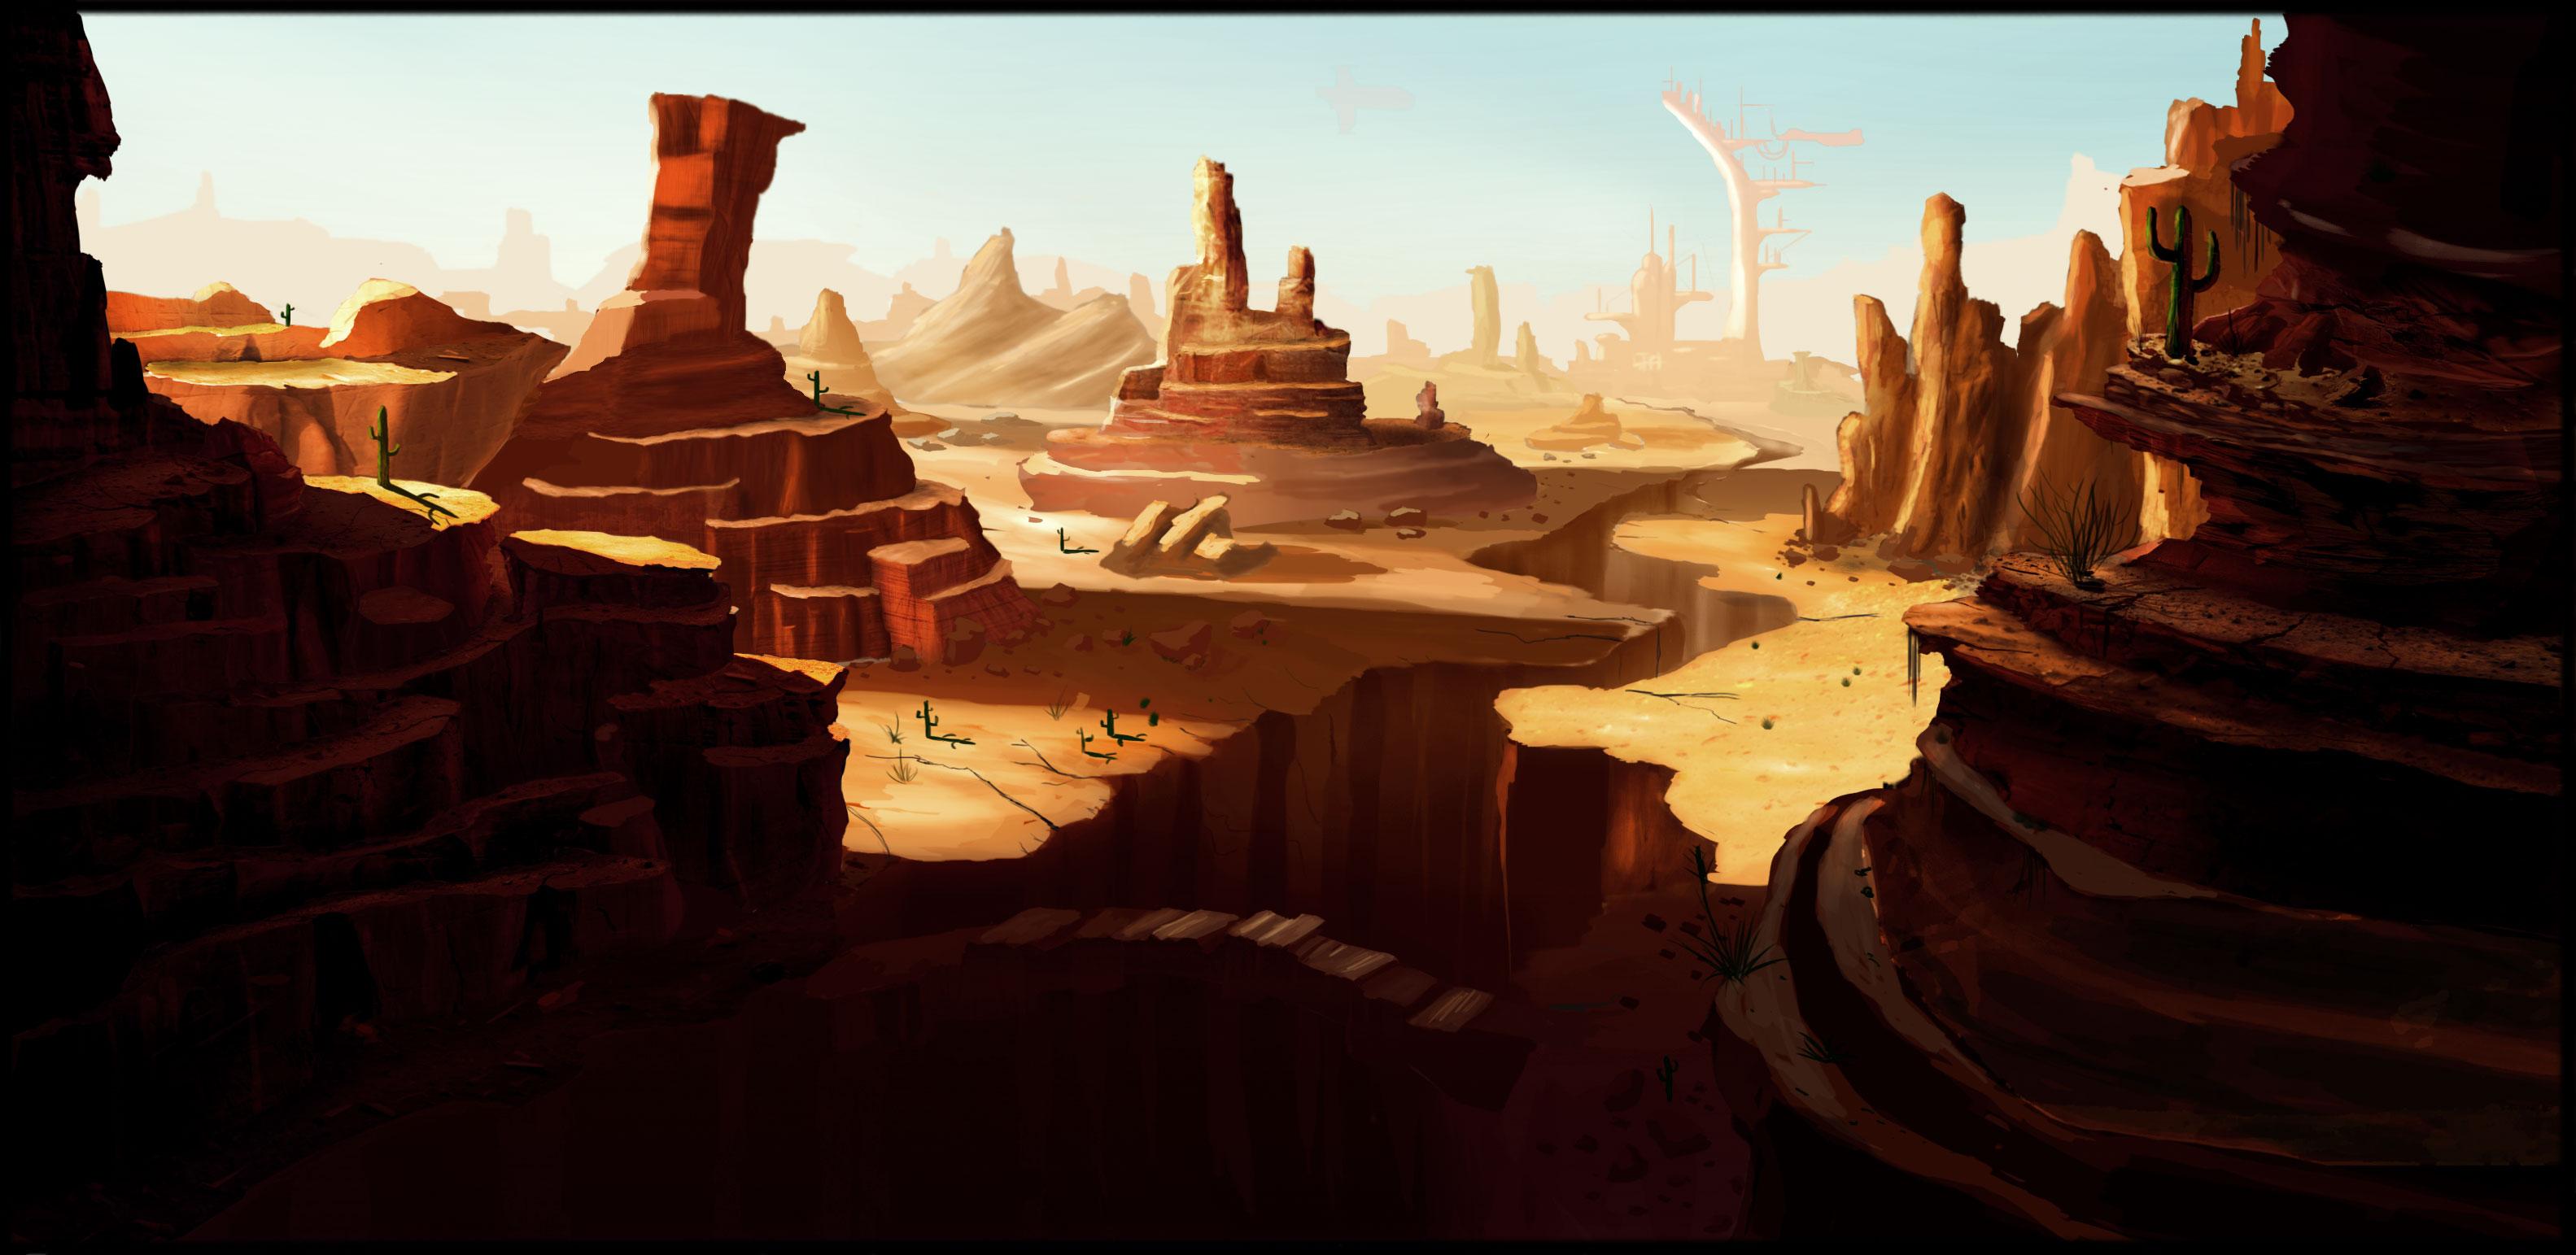 canyon-300dpiv19-big.jpg